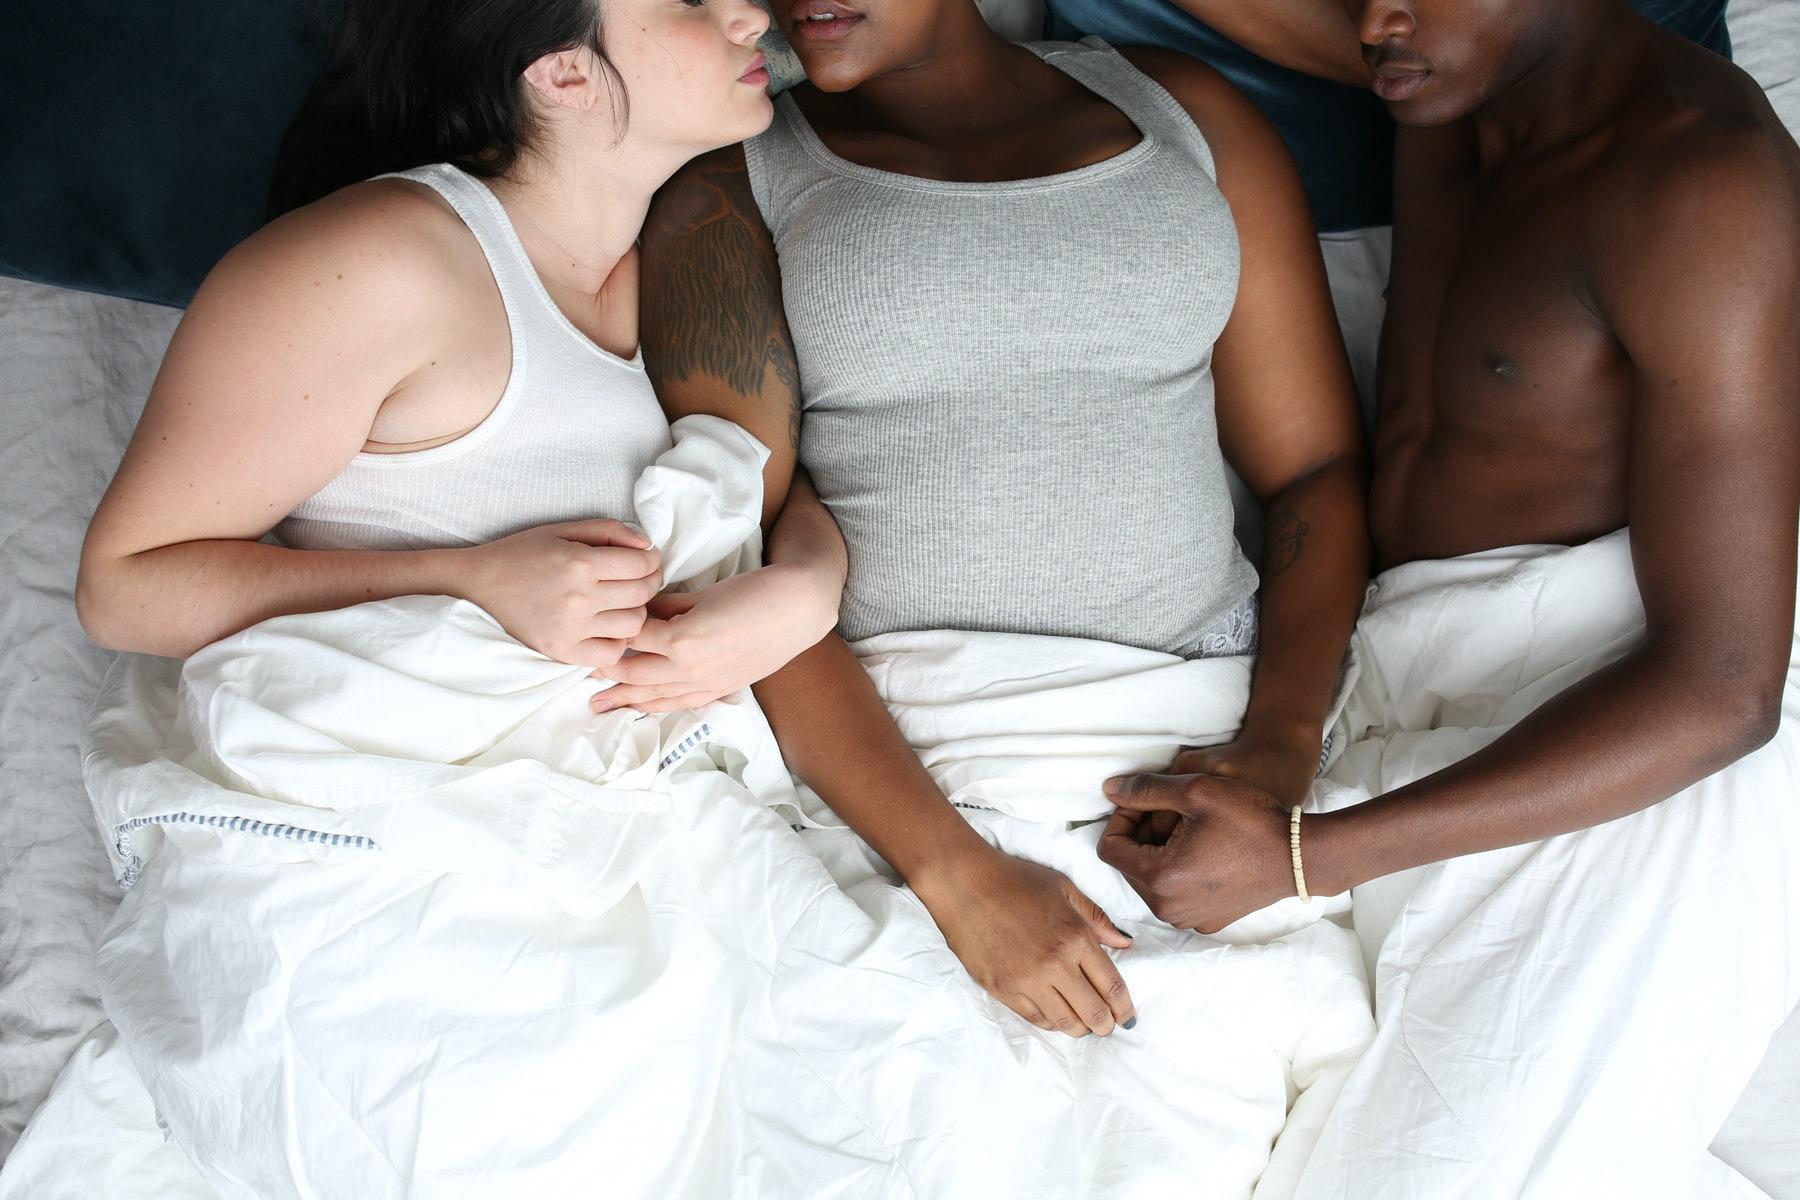 Threesome sex risks